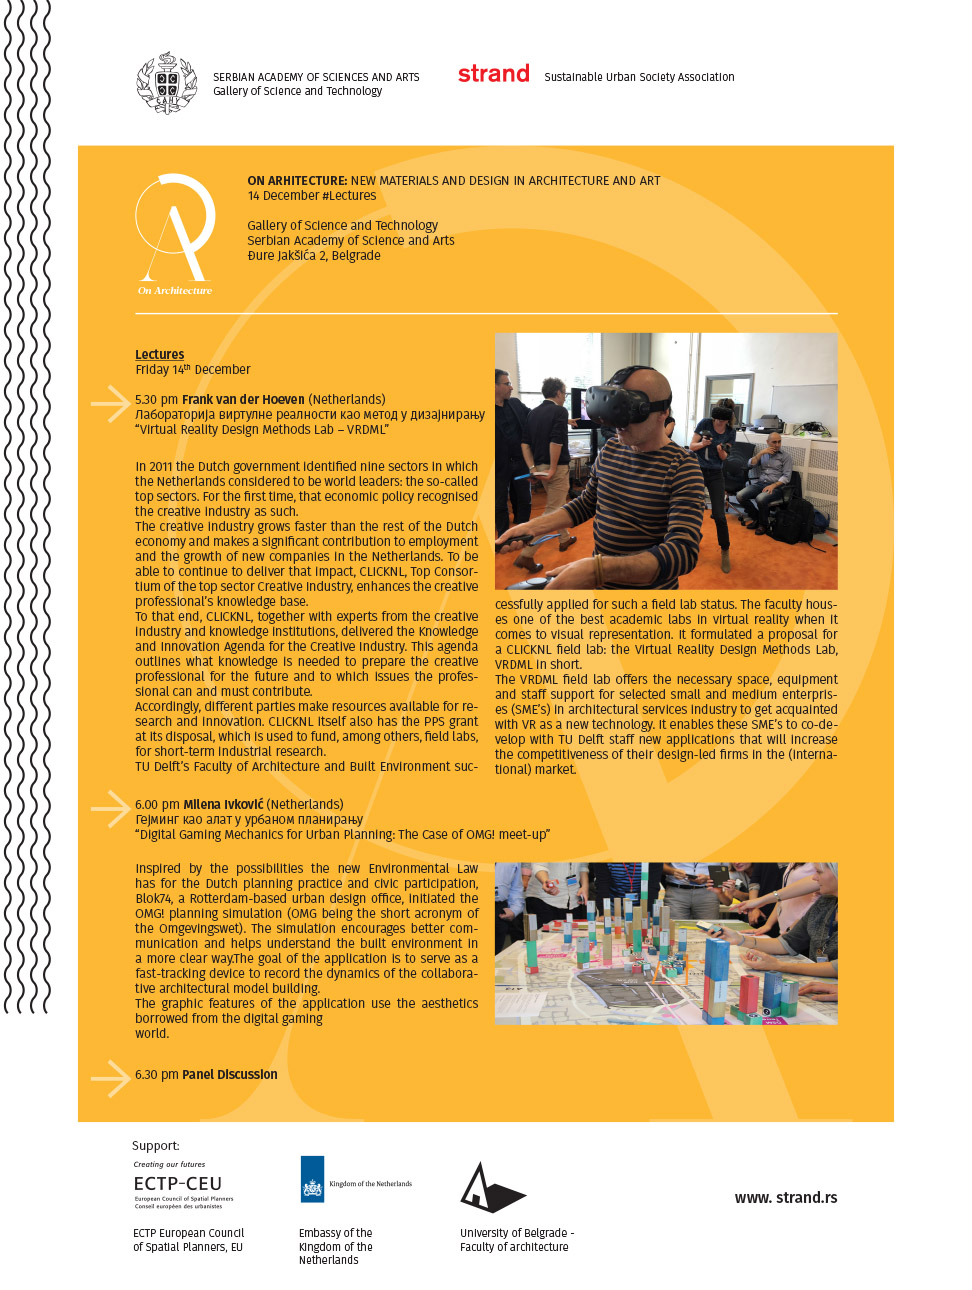 Serija-dogadjaja-O-arhitekturi-2018_Lectures